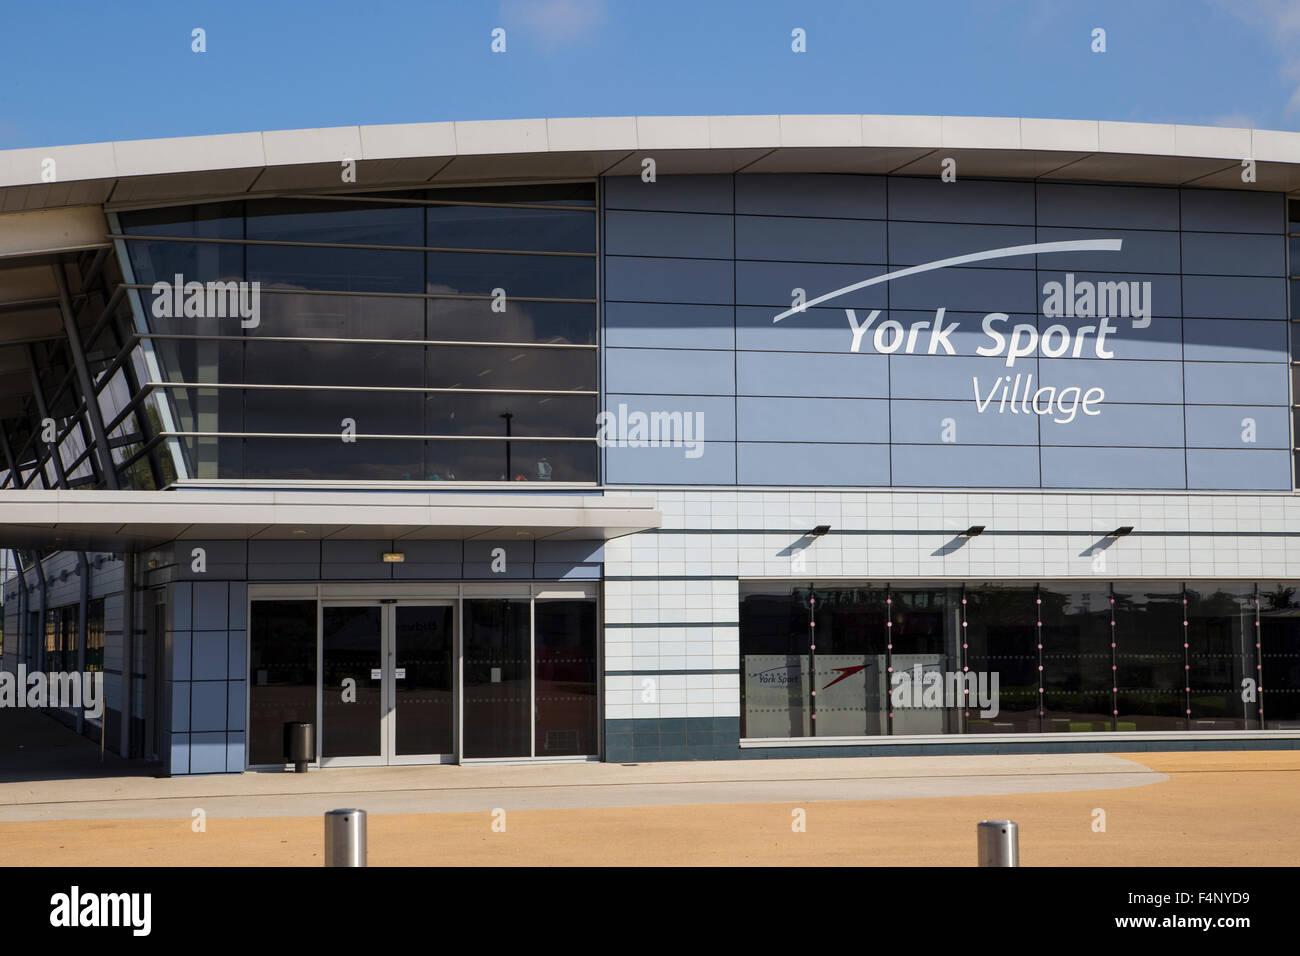 York Sport Village, Heslington, York. - Stock Image